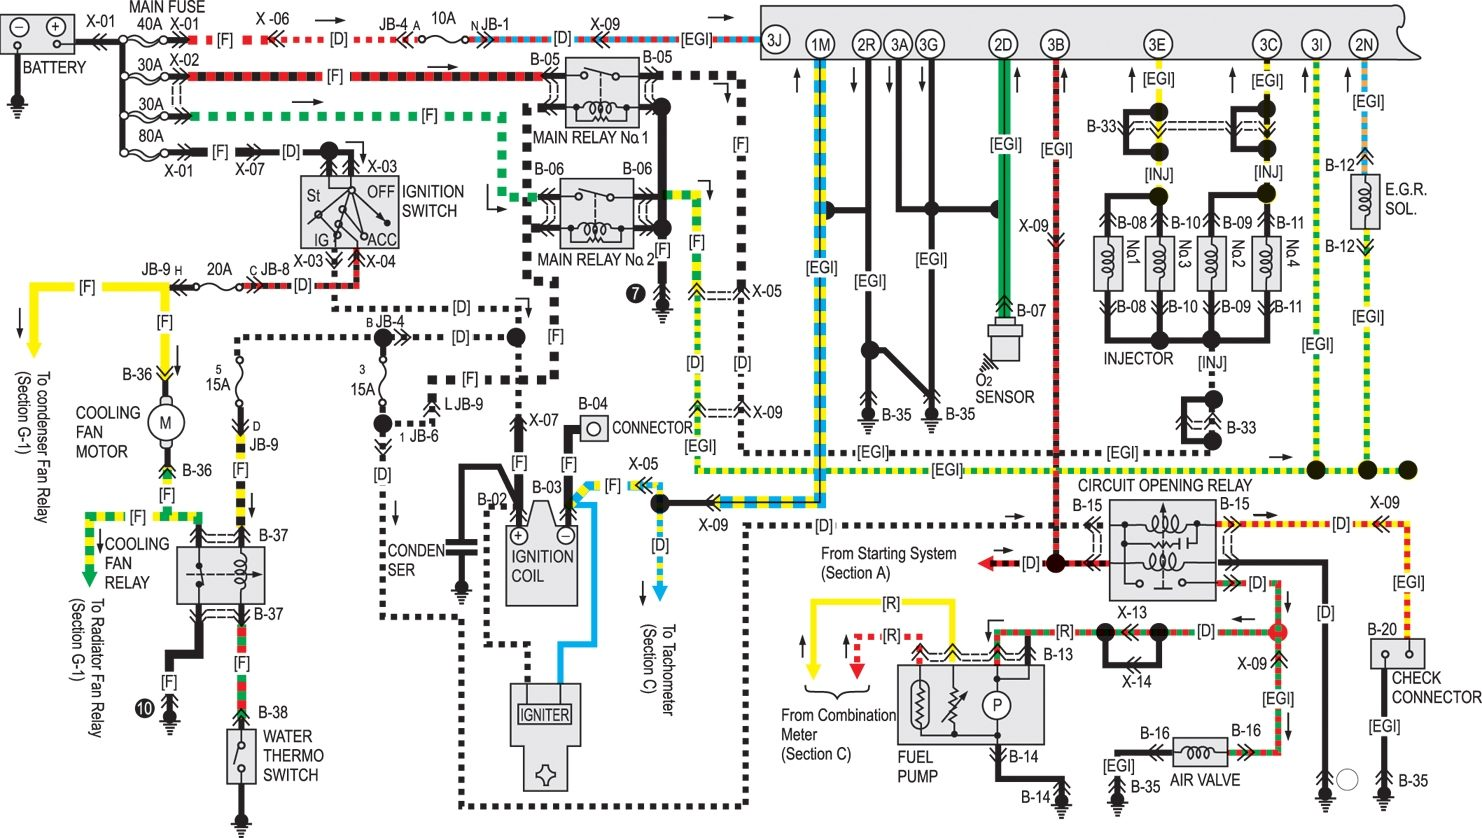 схема электрооборудования mazda ms-8 efini